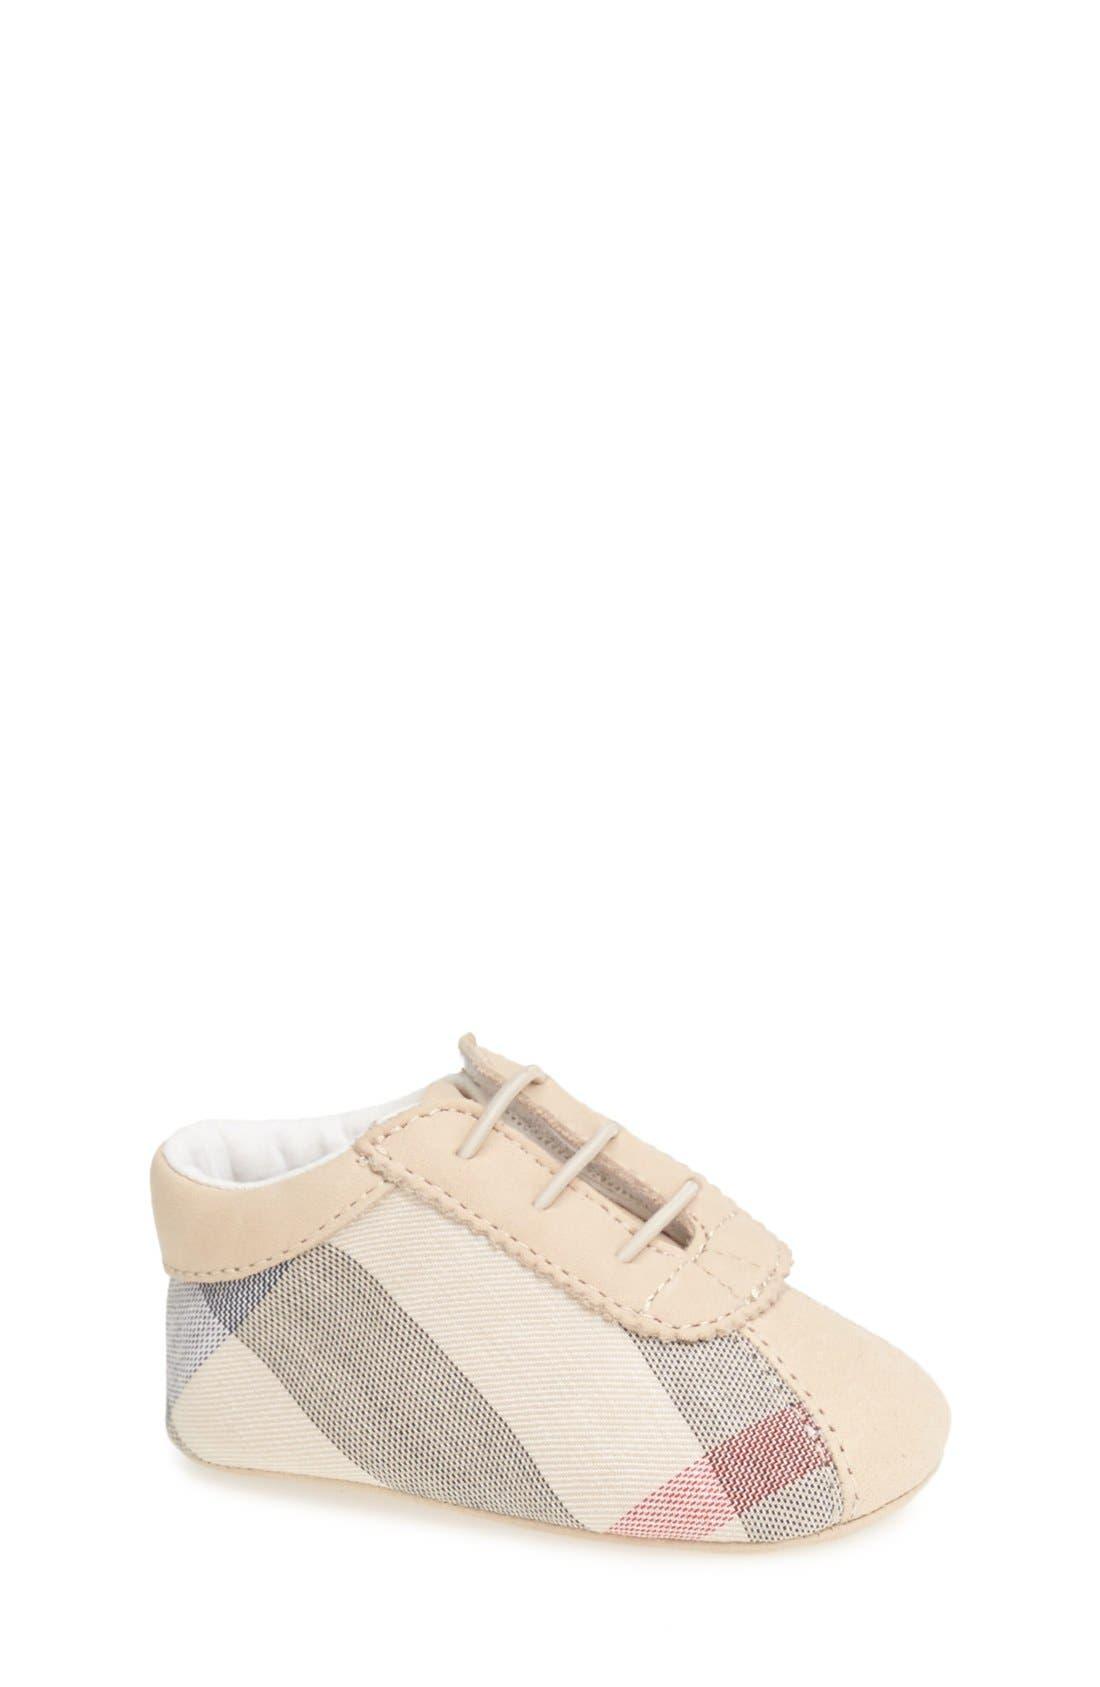 Burberry 'Bosco' Crib Shoe (Baby)